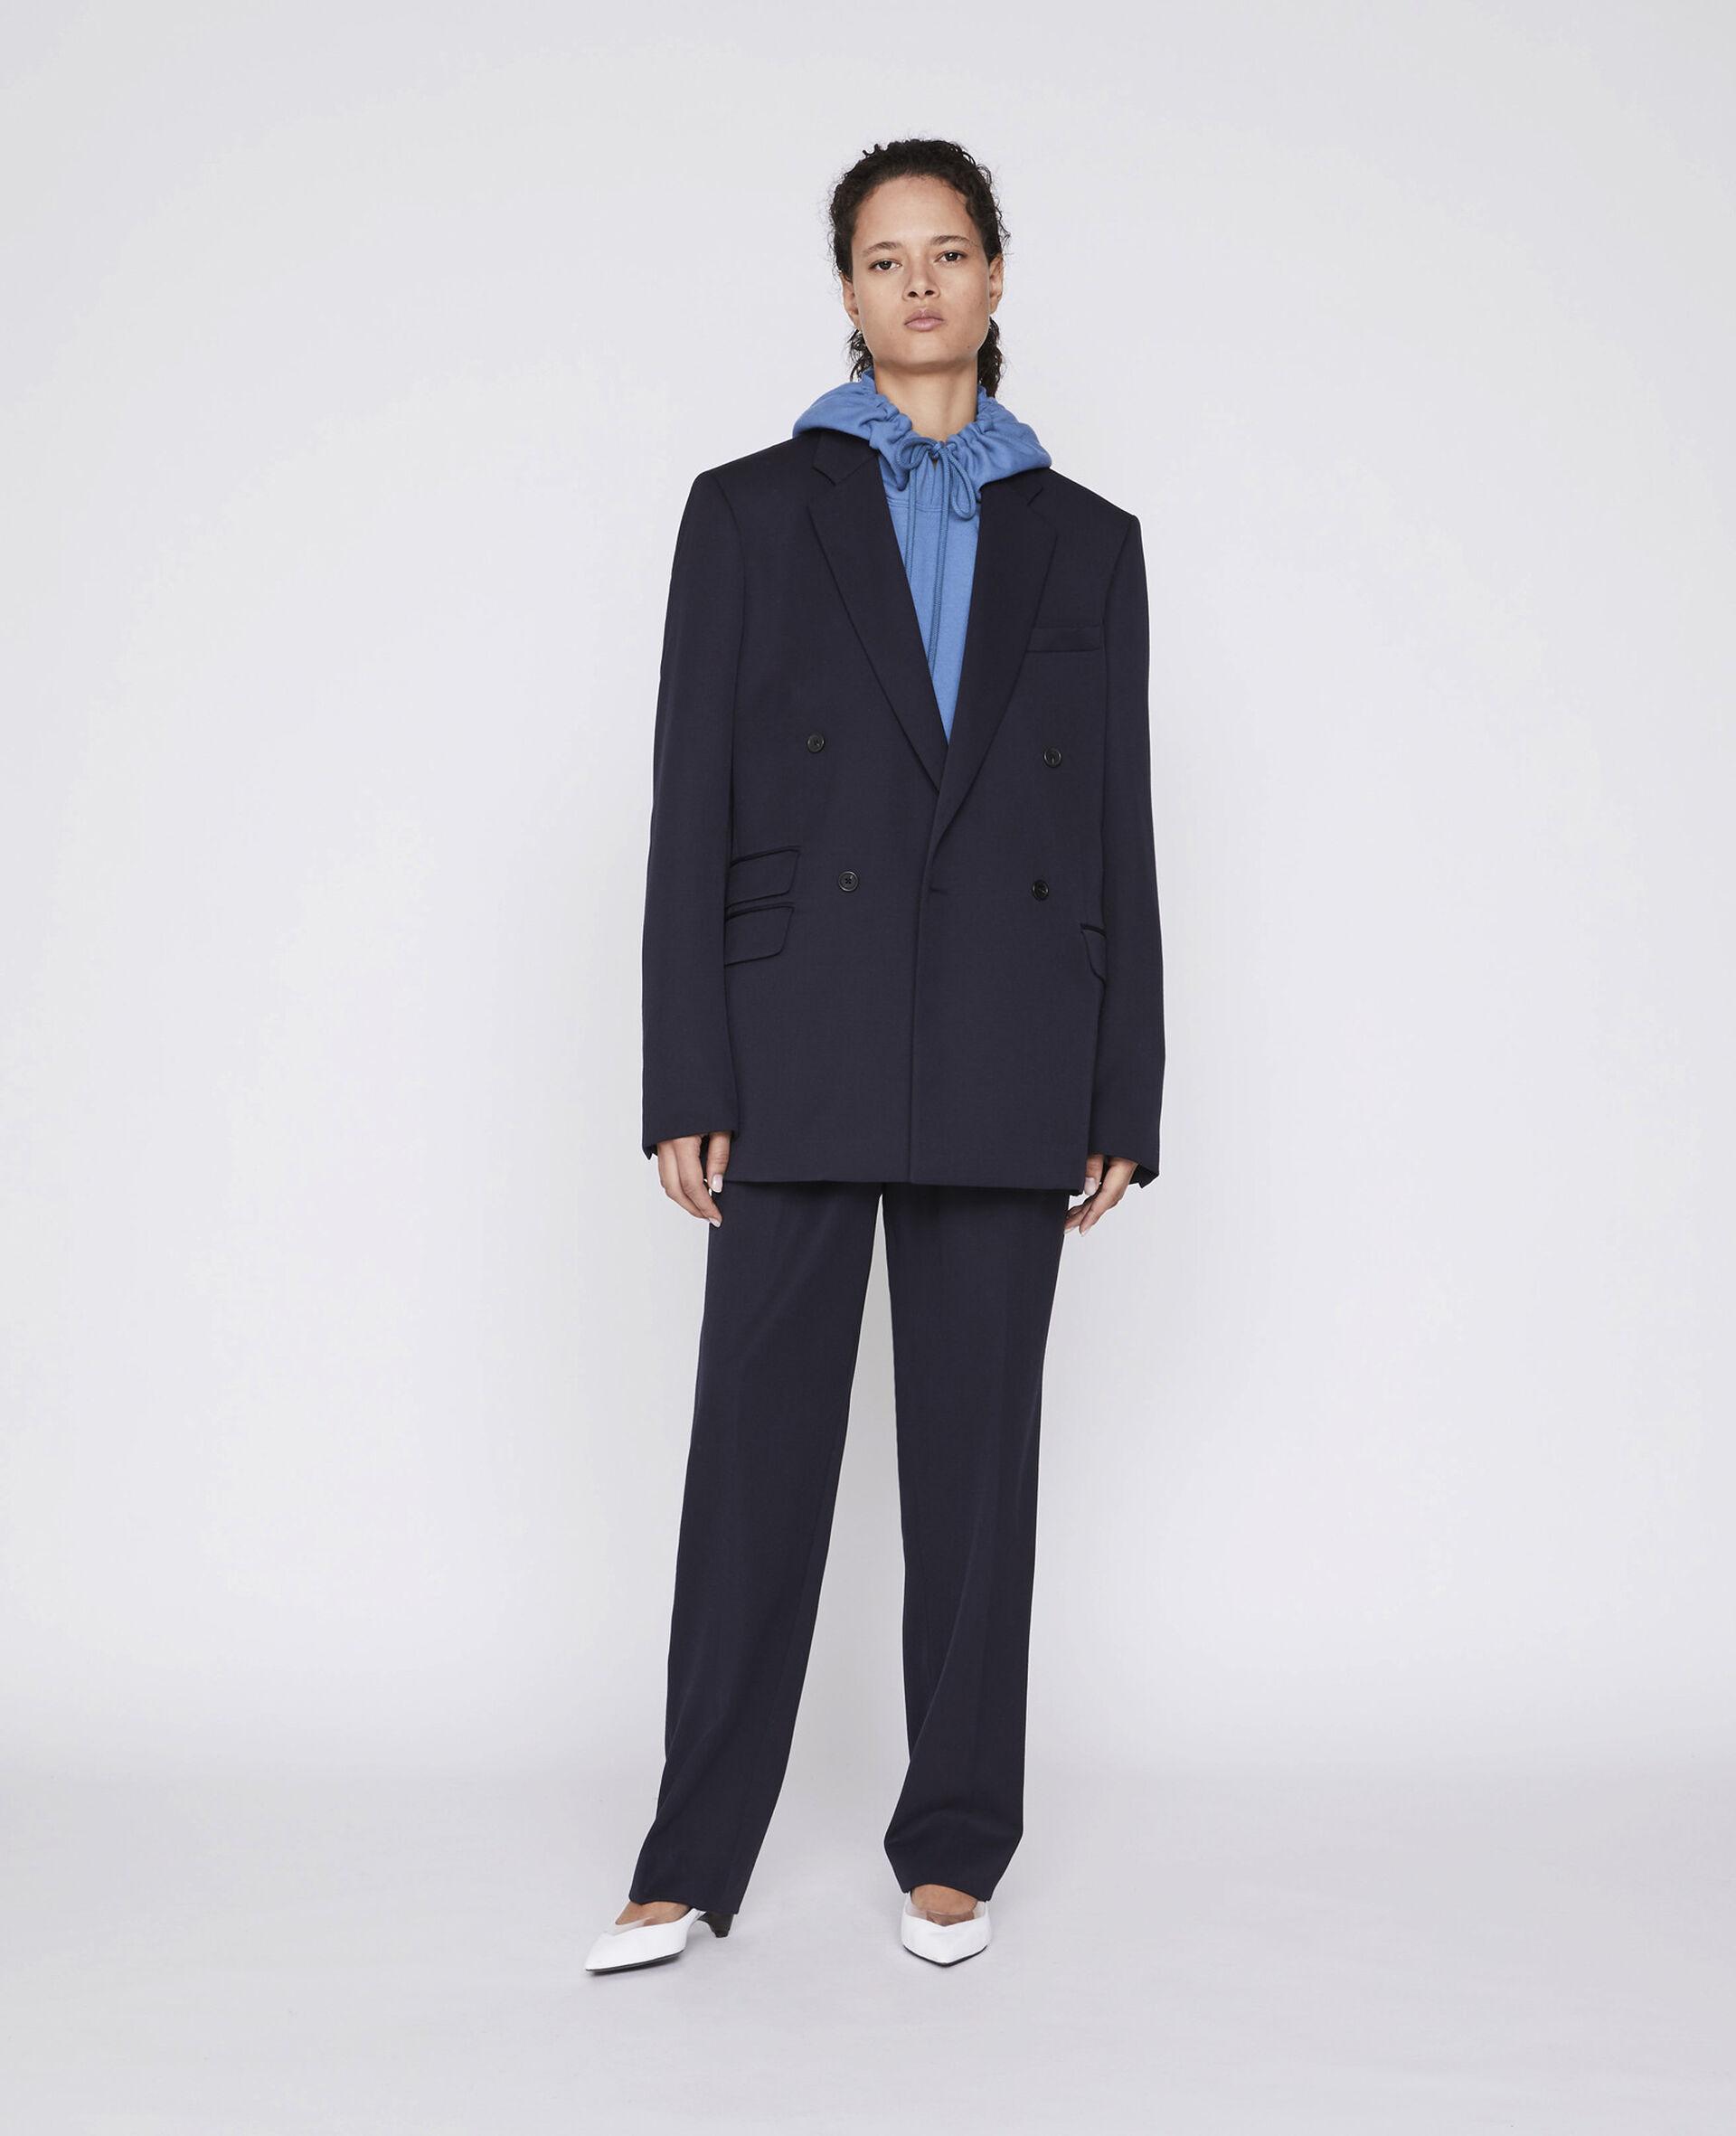 Couture-Jackett Holden-Blau-large image number 3